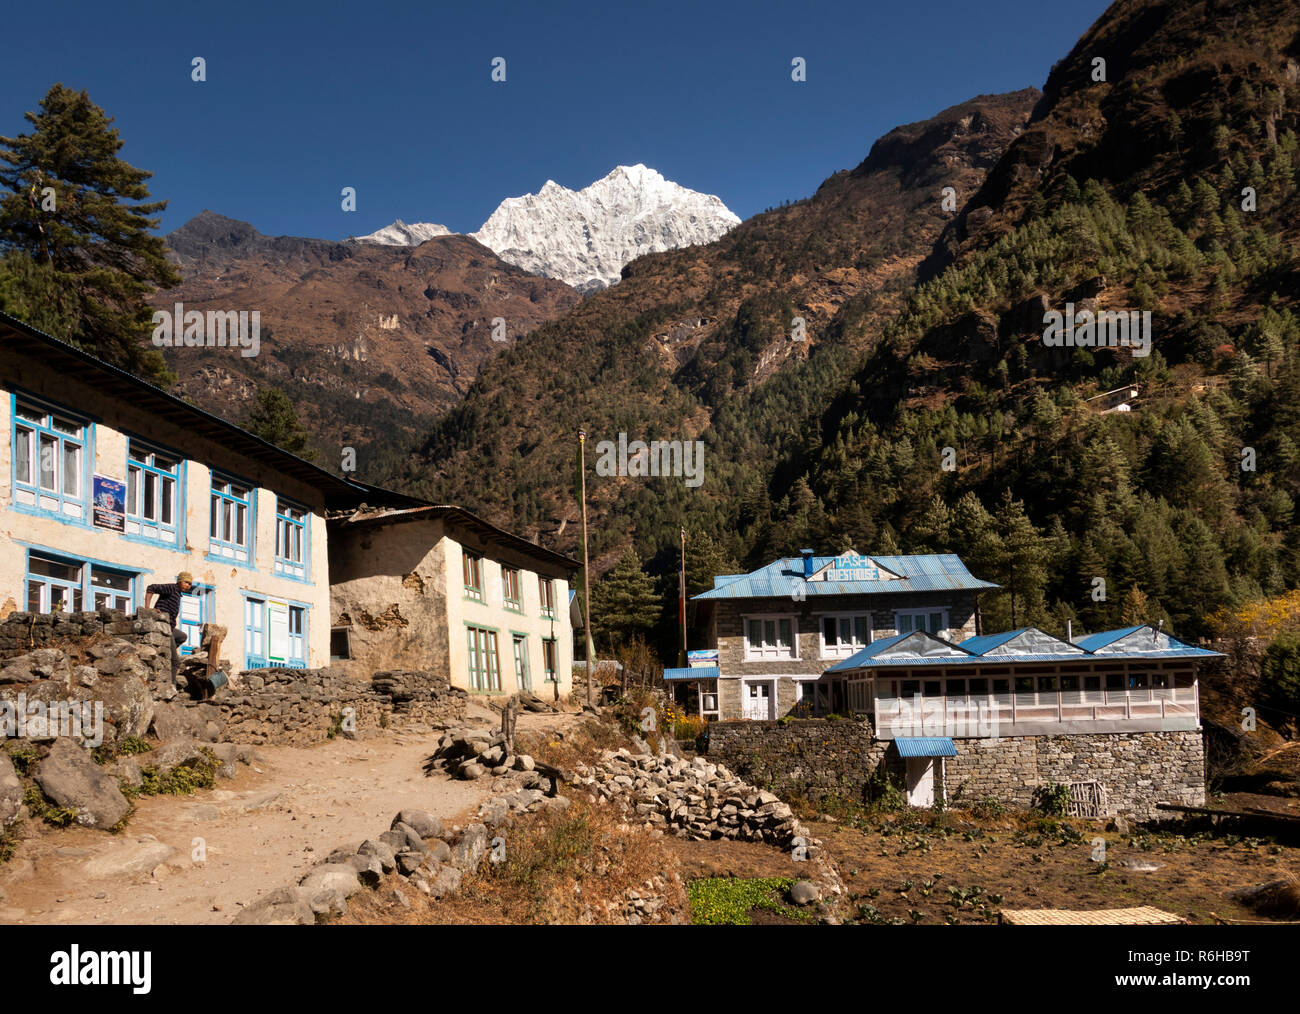 Nepal, Benkar, small local guest houses beside Everest Base Camp Trek path below Mount Kusum Kangkaru - Stock Image